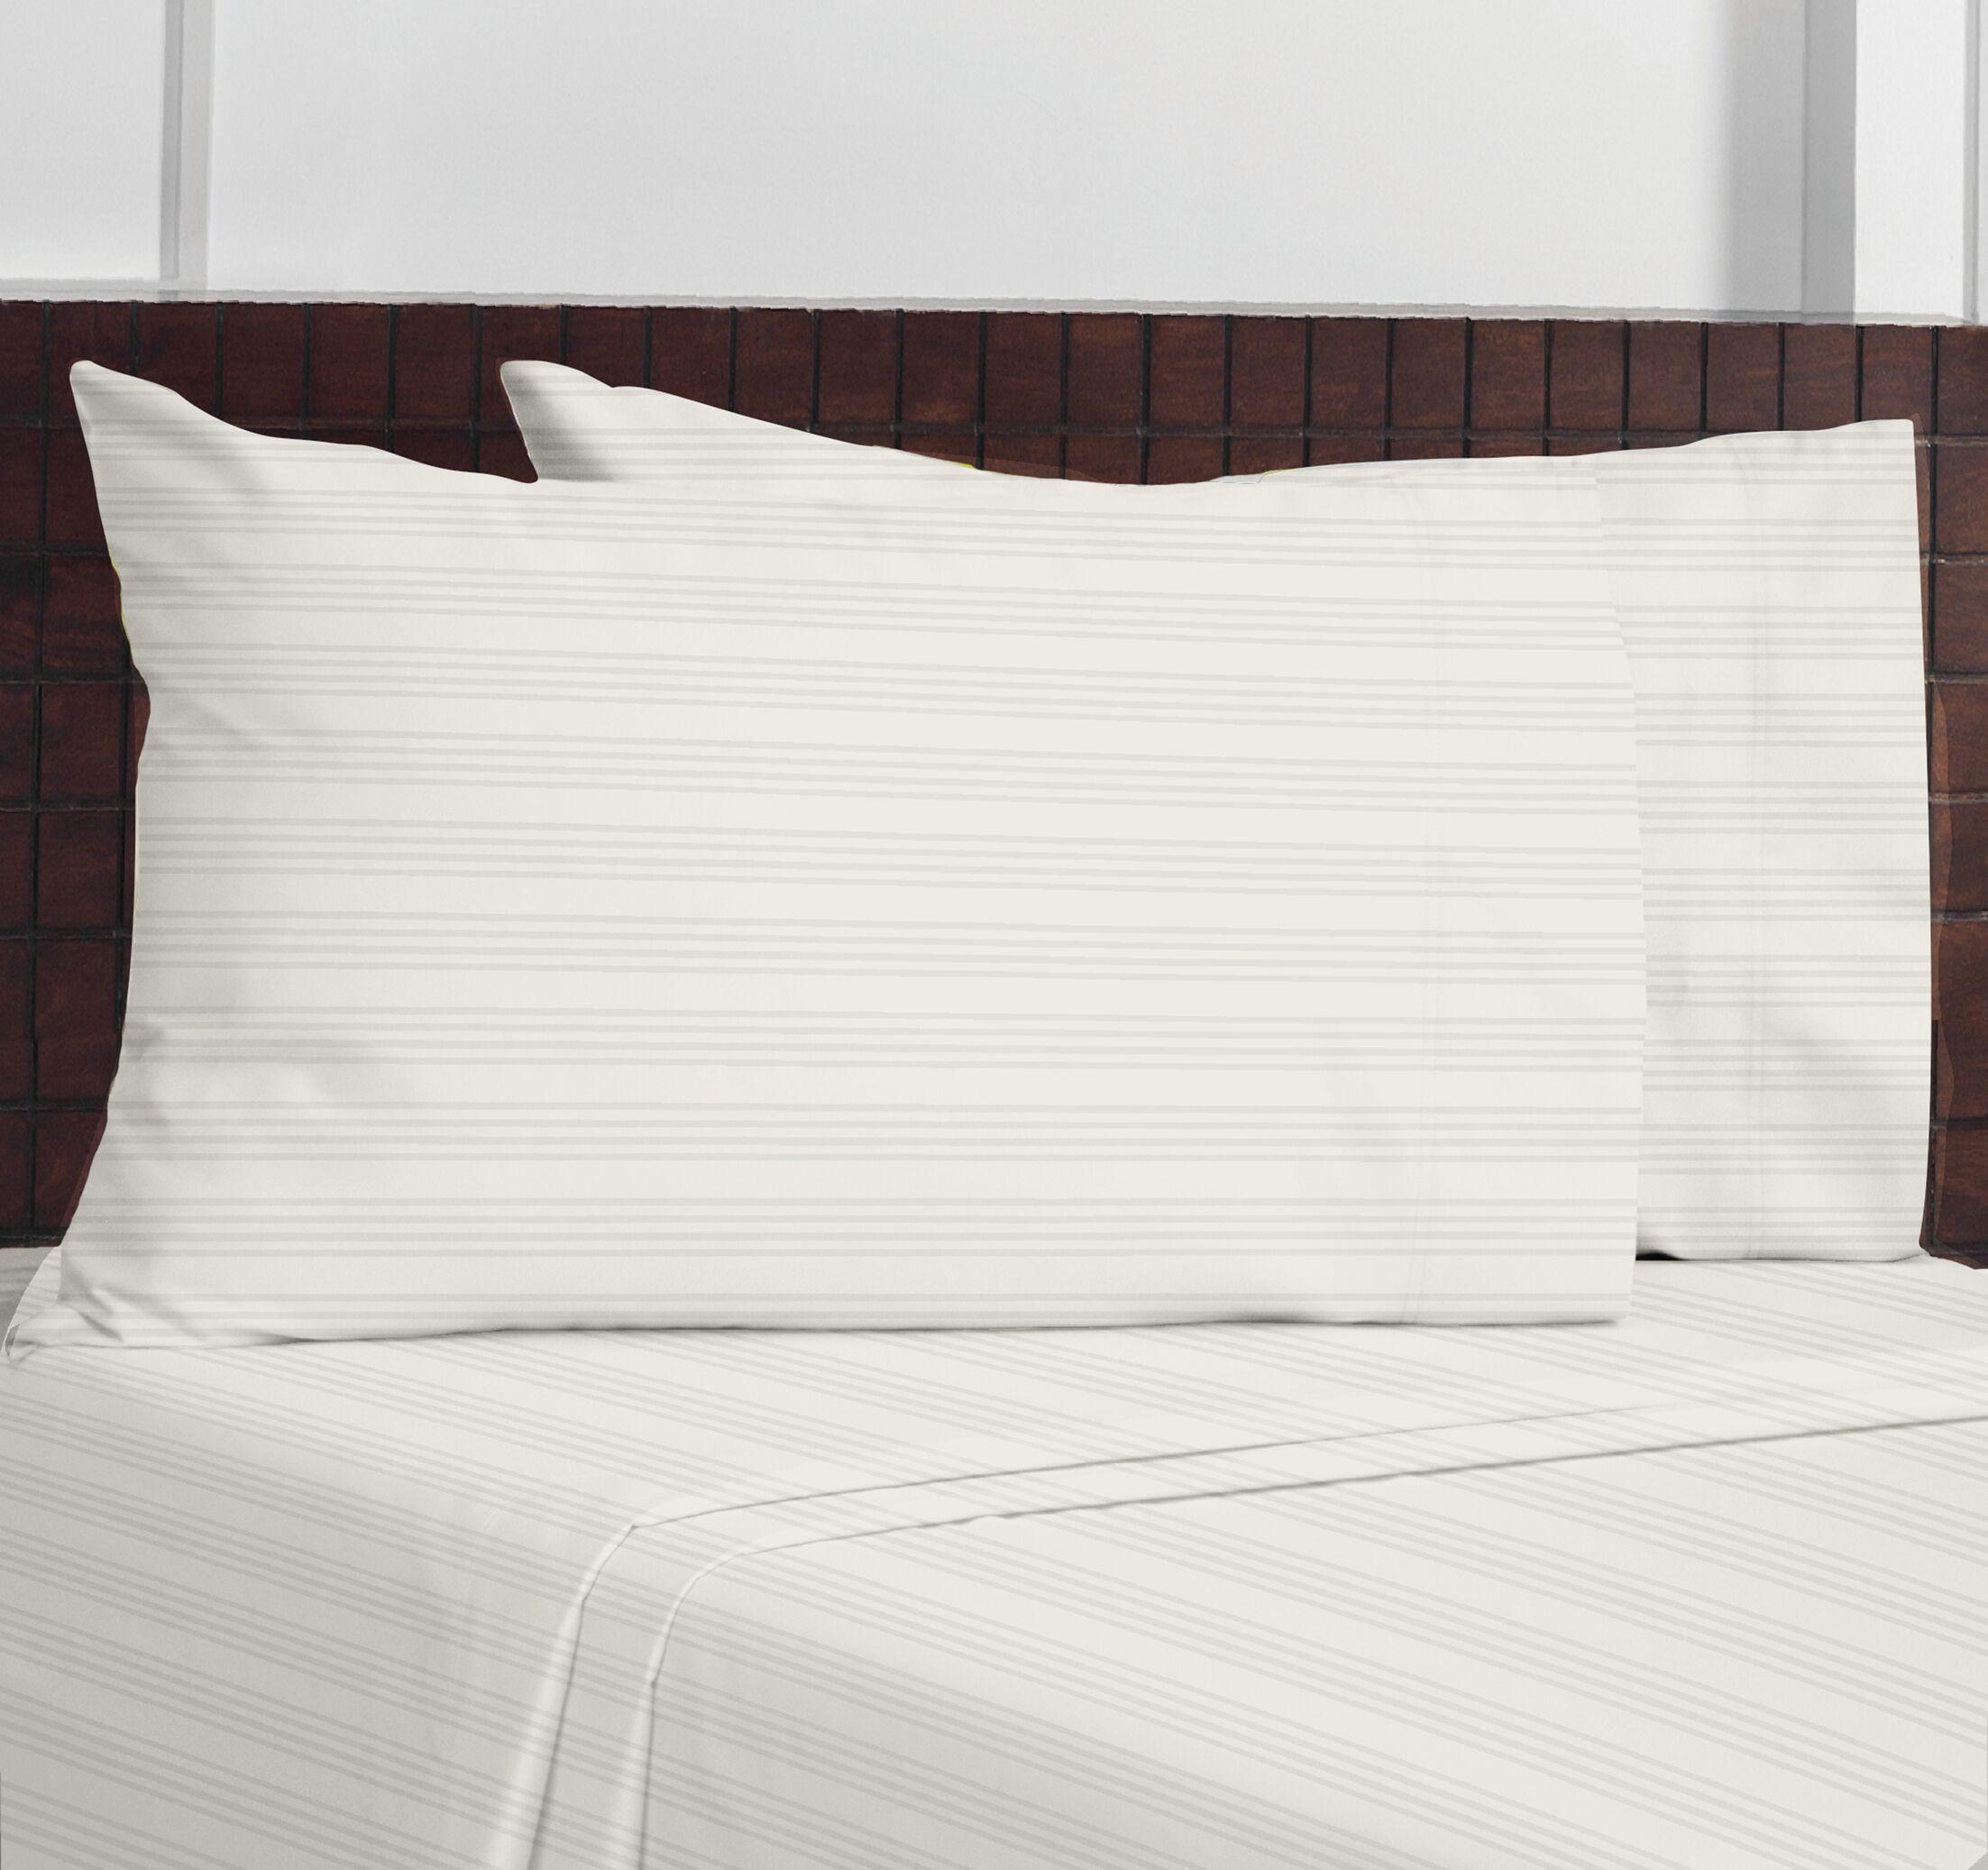 Edmont Stripes 100% Cotton Sheet Set Size: King, Color: White